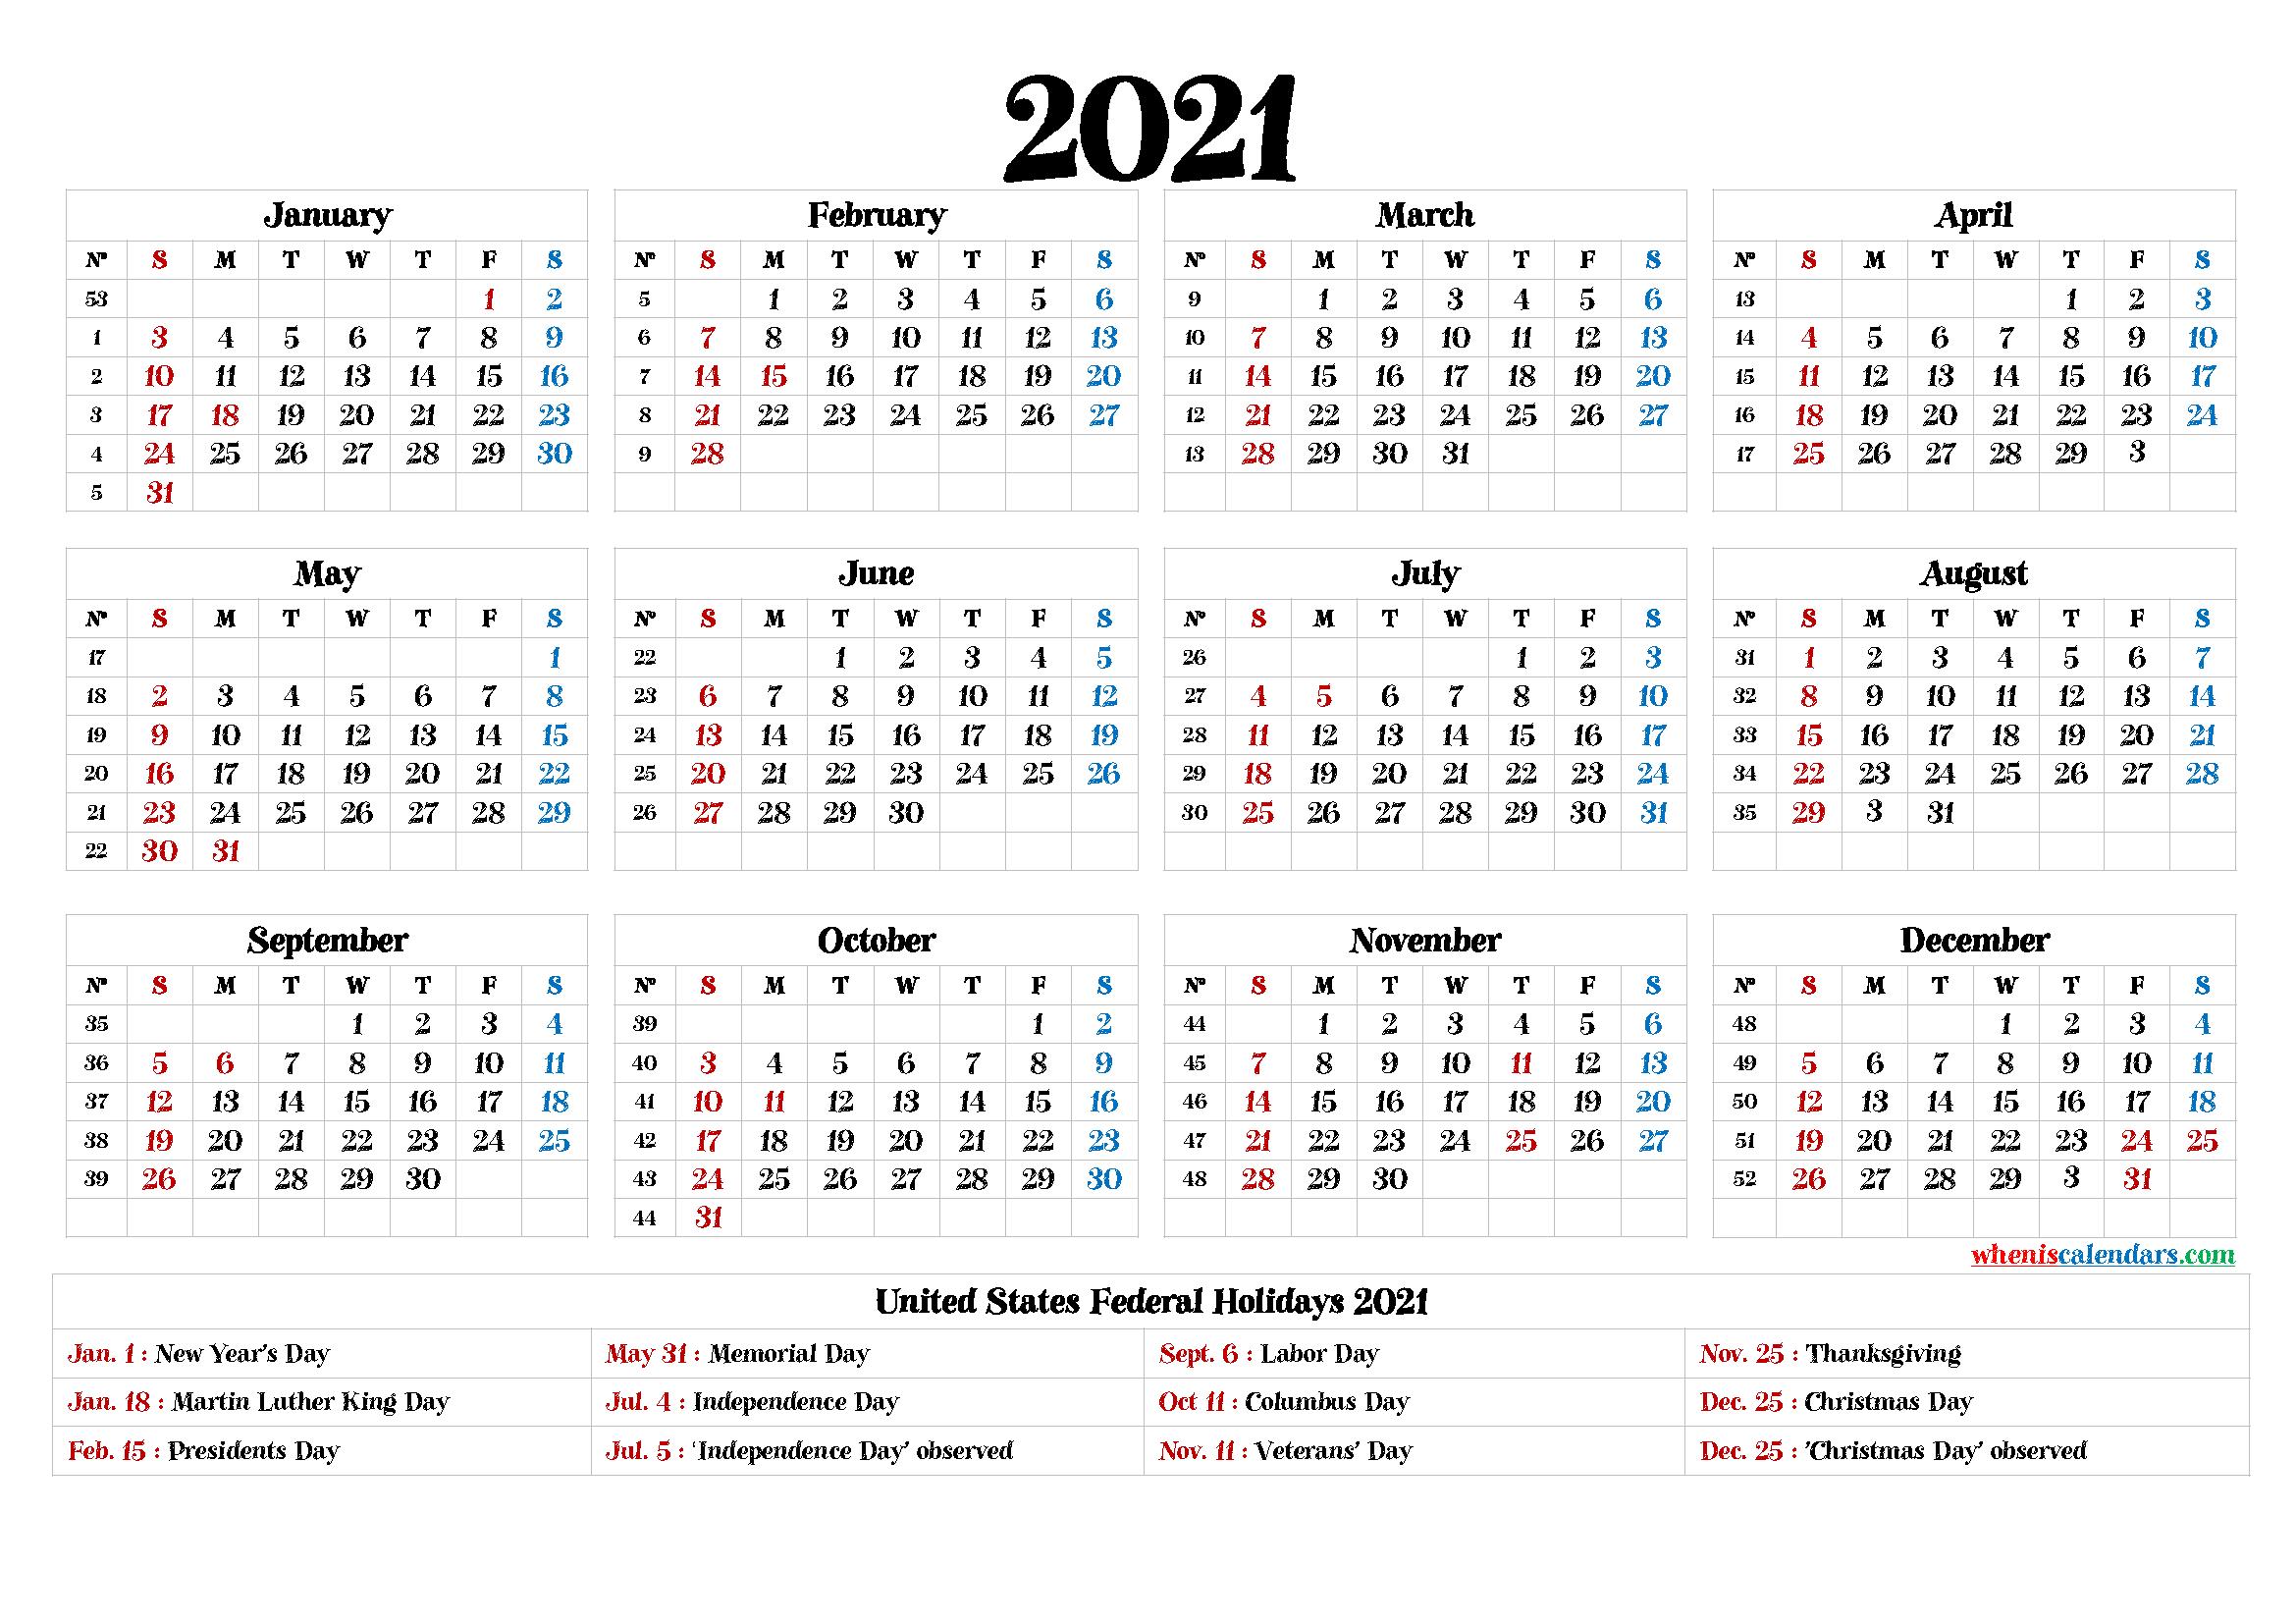 Printable Calendar 2021 Pdf - 9 Templates-2021 Monthly Calendar Printable Pdf